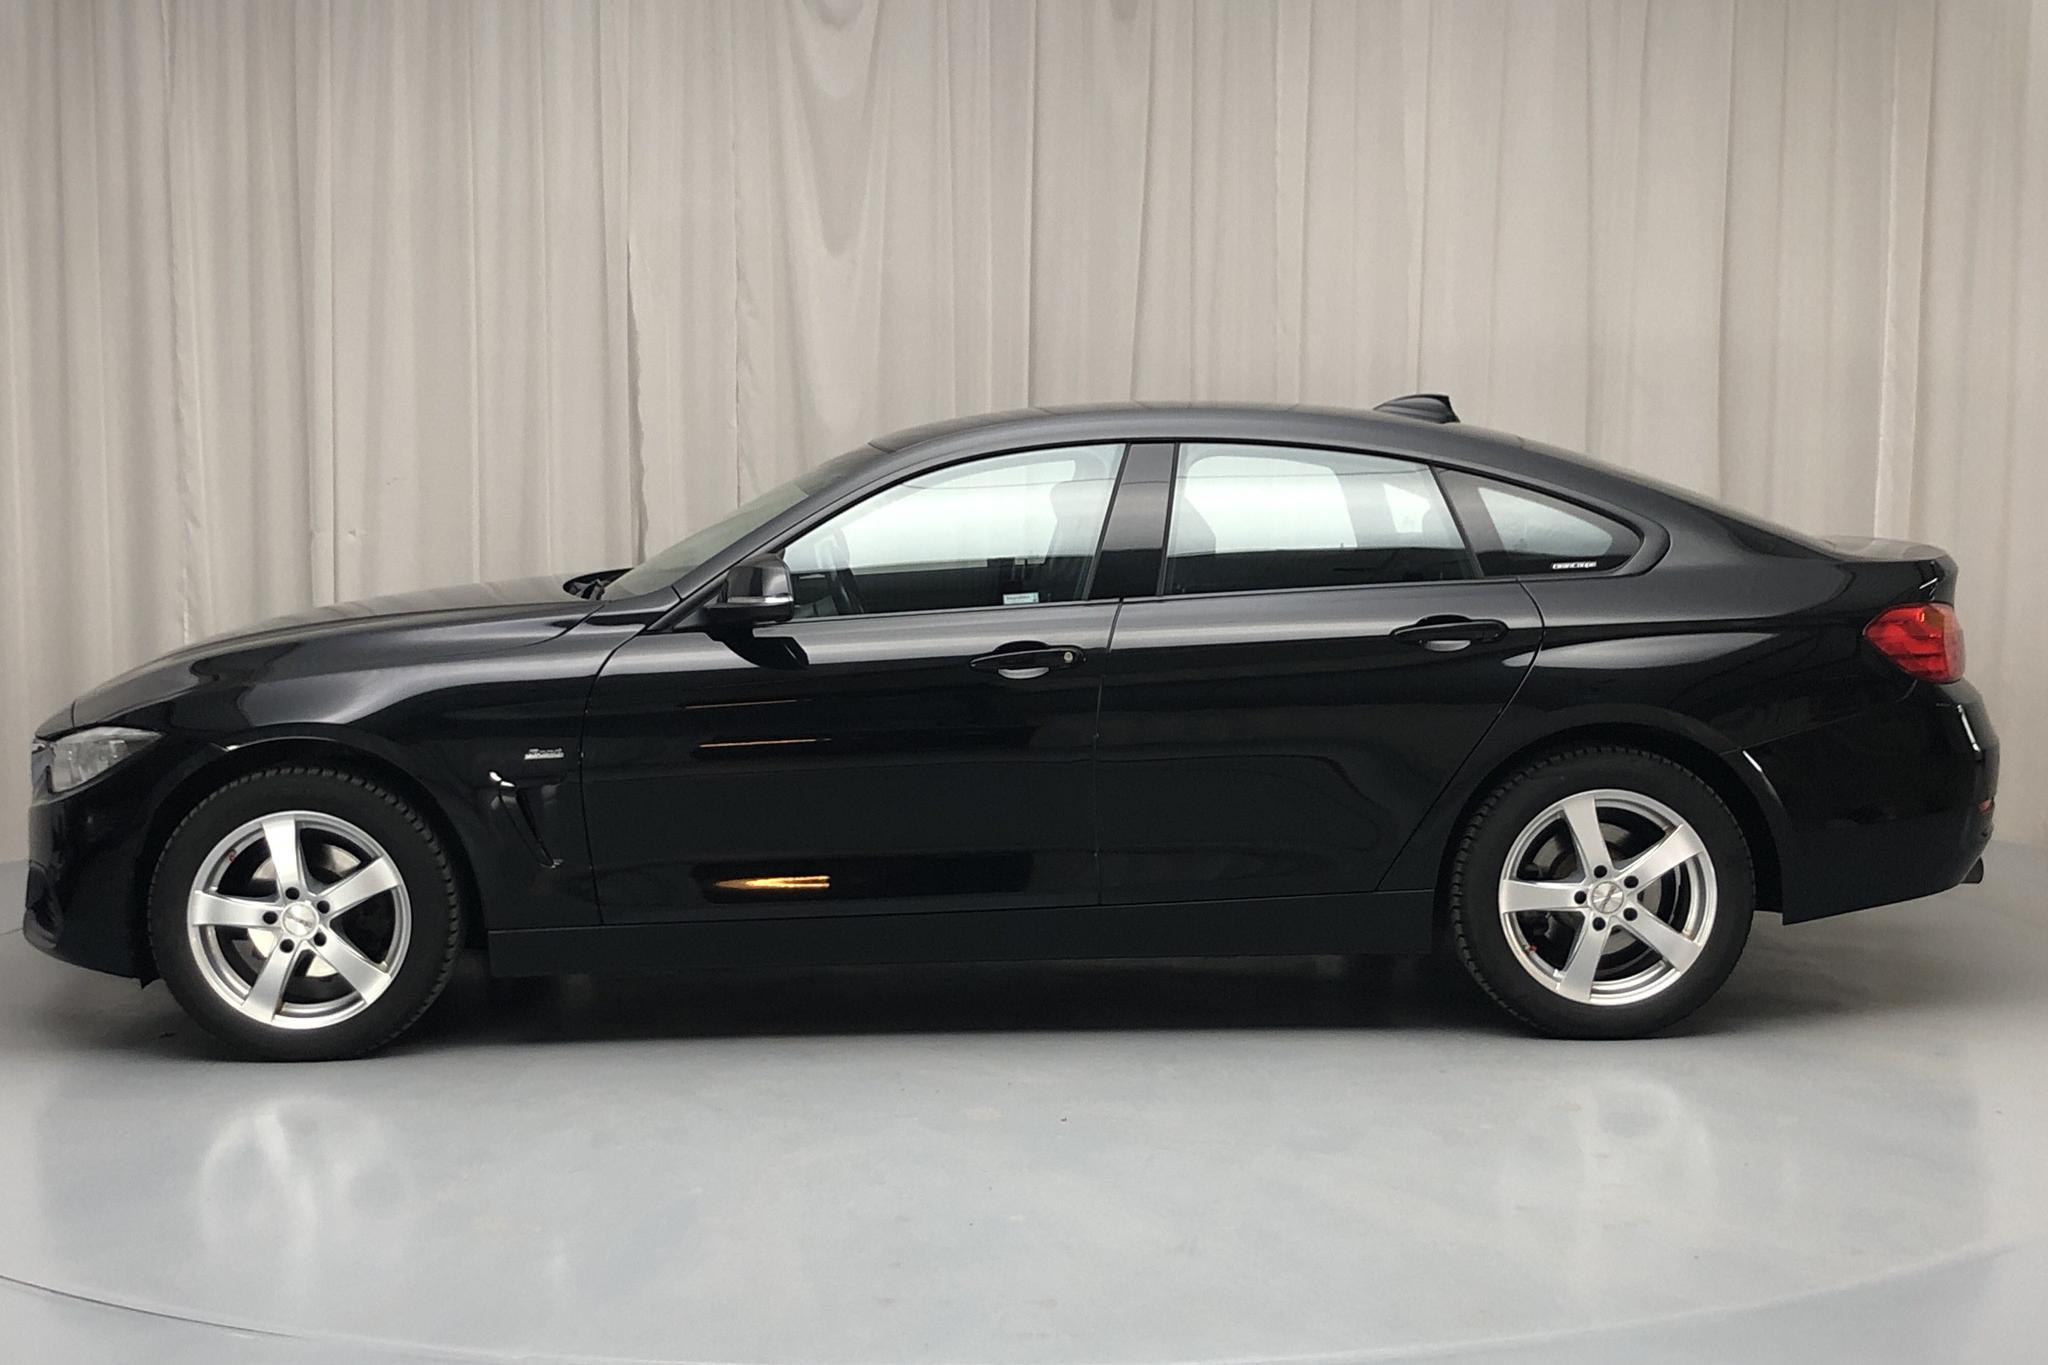 BMW 420i xDrive Gran Coupé, F36 (184hk) - 8 935 mil - Manuell - svart - 2017